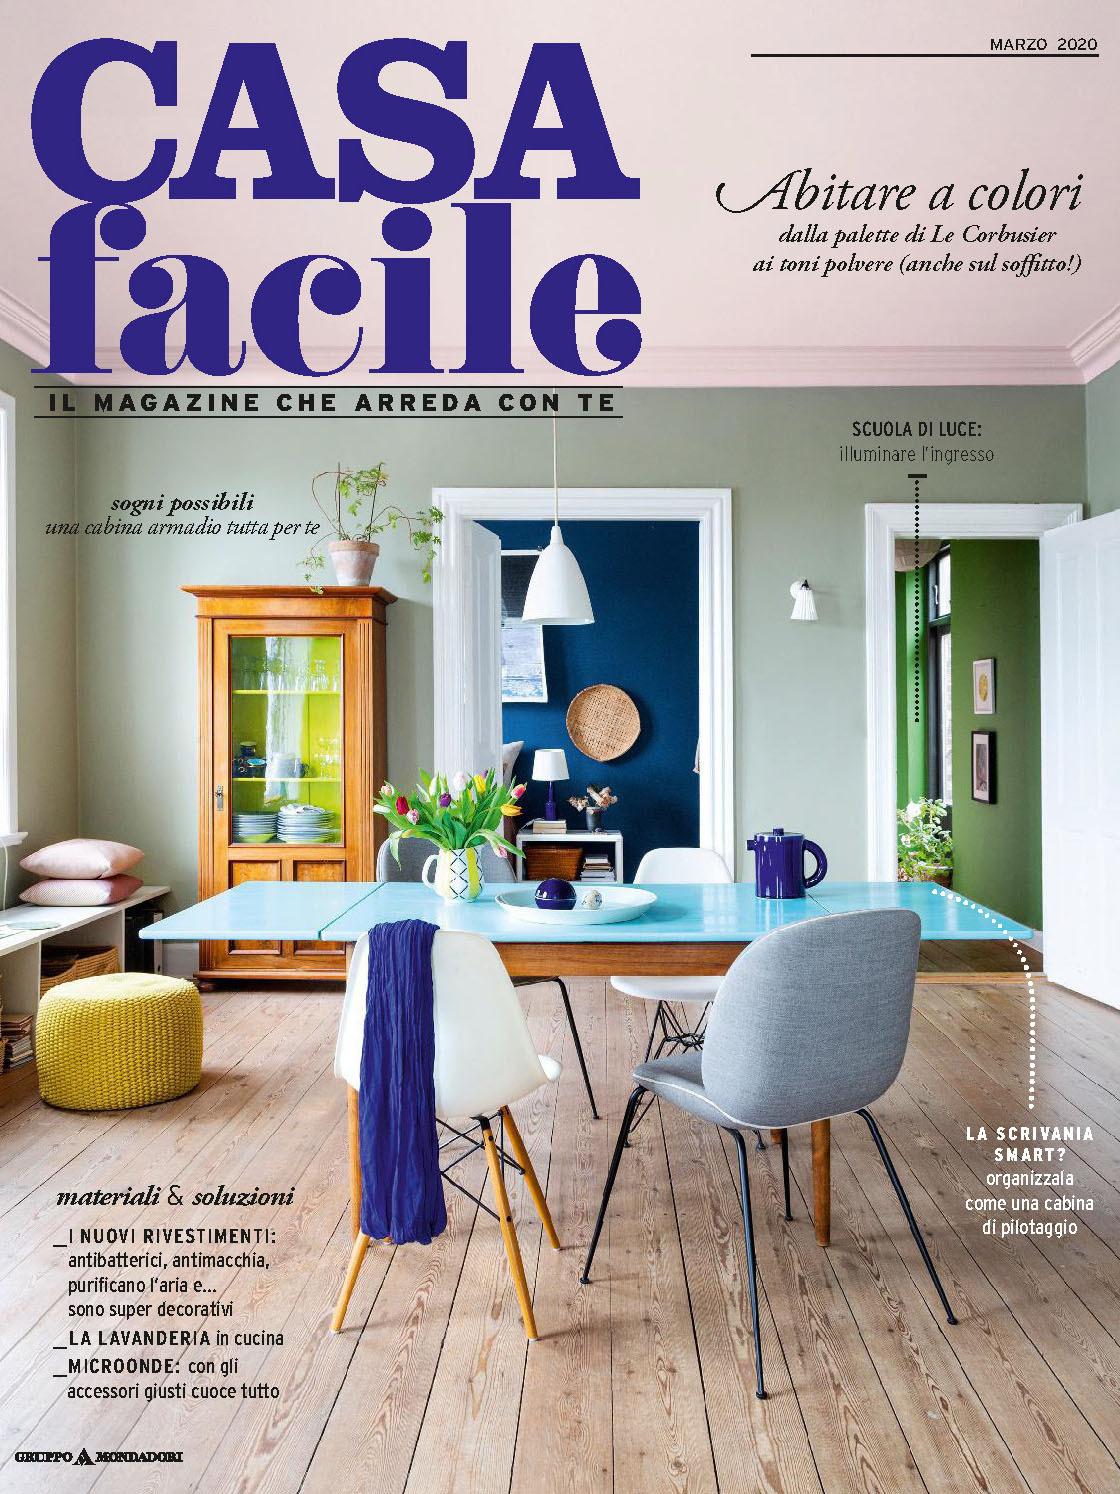 《Casa Facile》意大利家居空间装饰艺术杂志2020年03月号